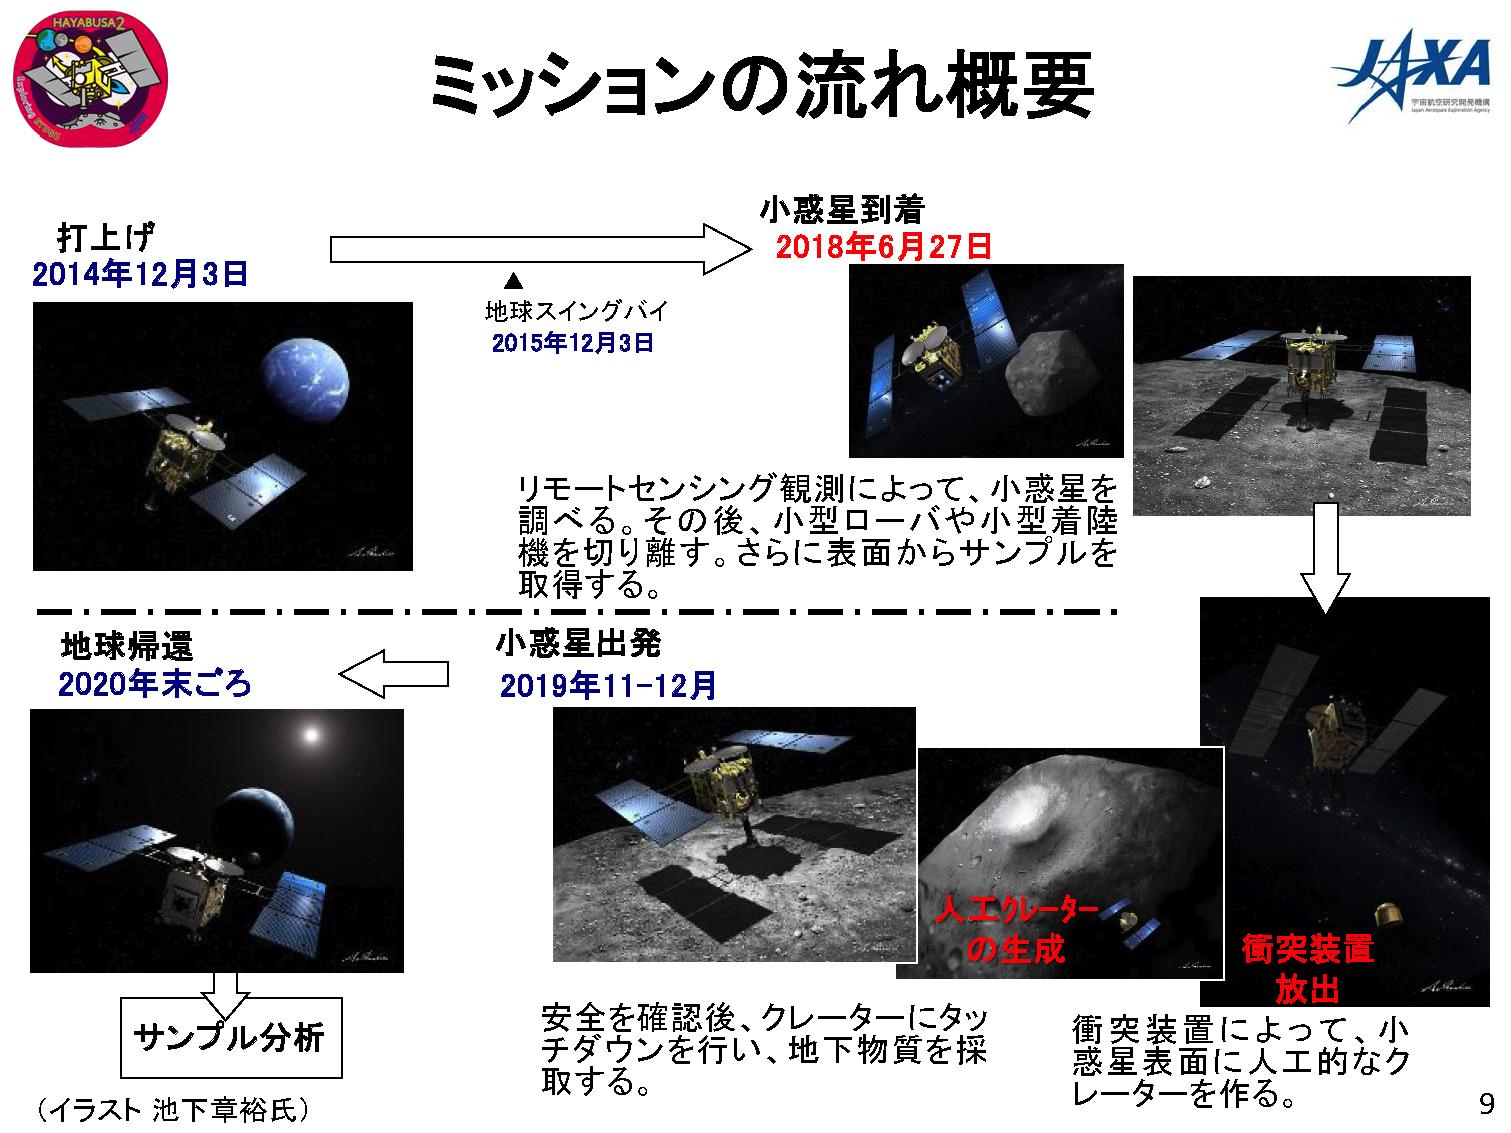 f:id:Imamura:20180627171838p:plain